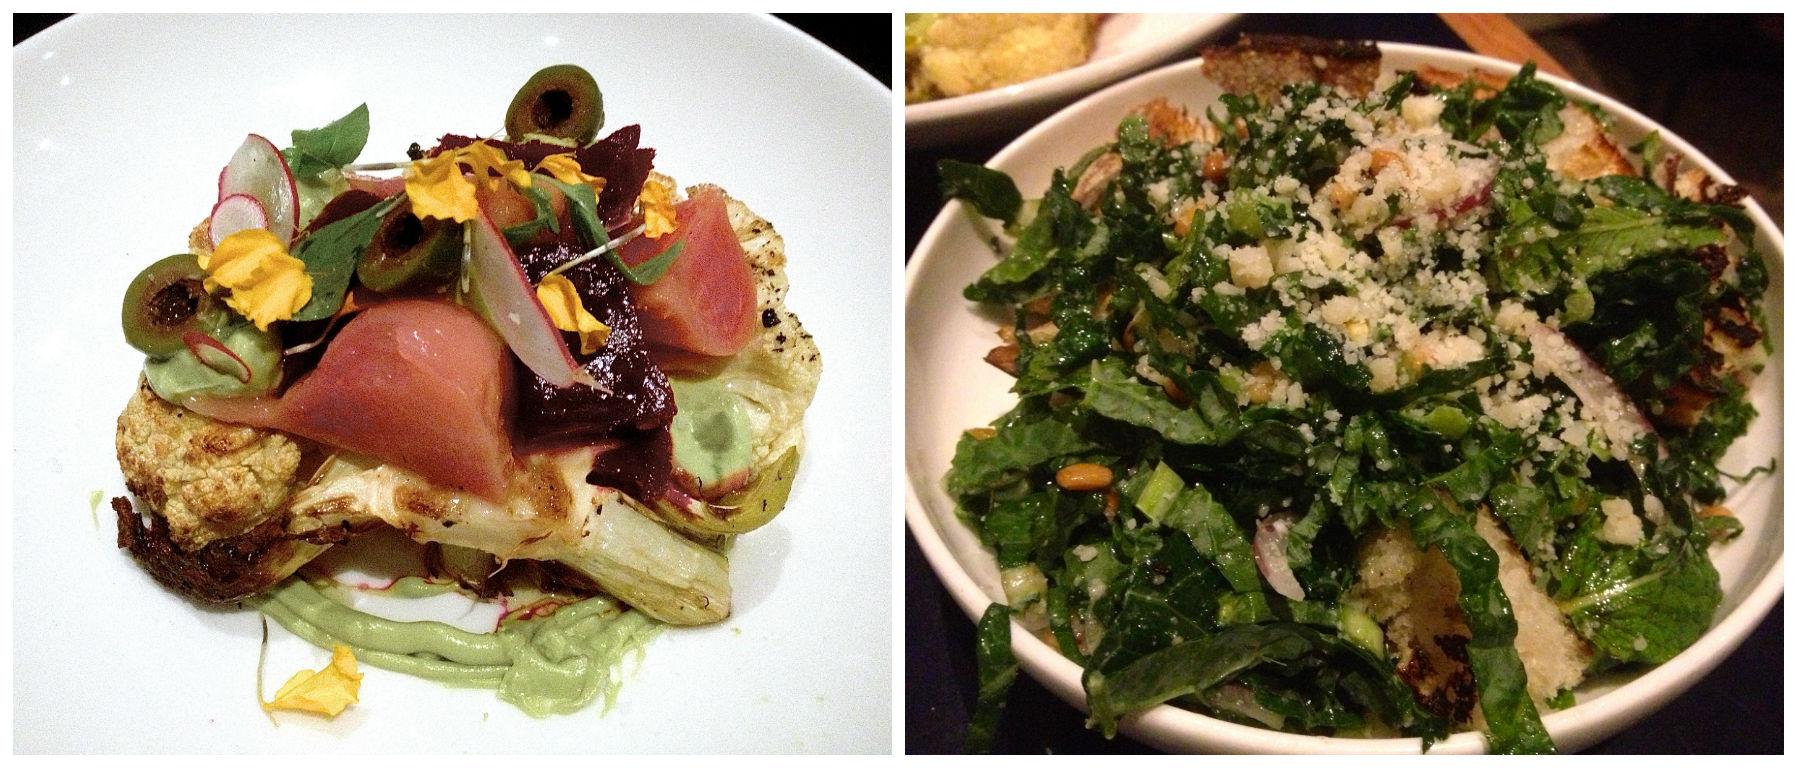 Cauliflower T-bone and Black Kale Salad